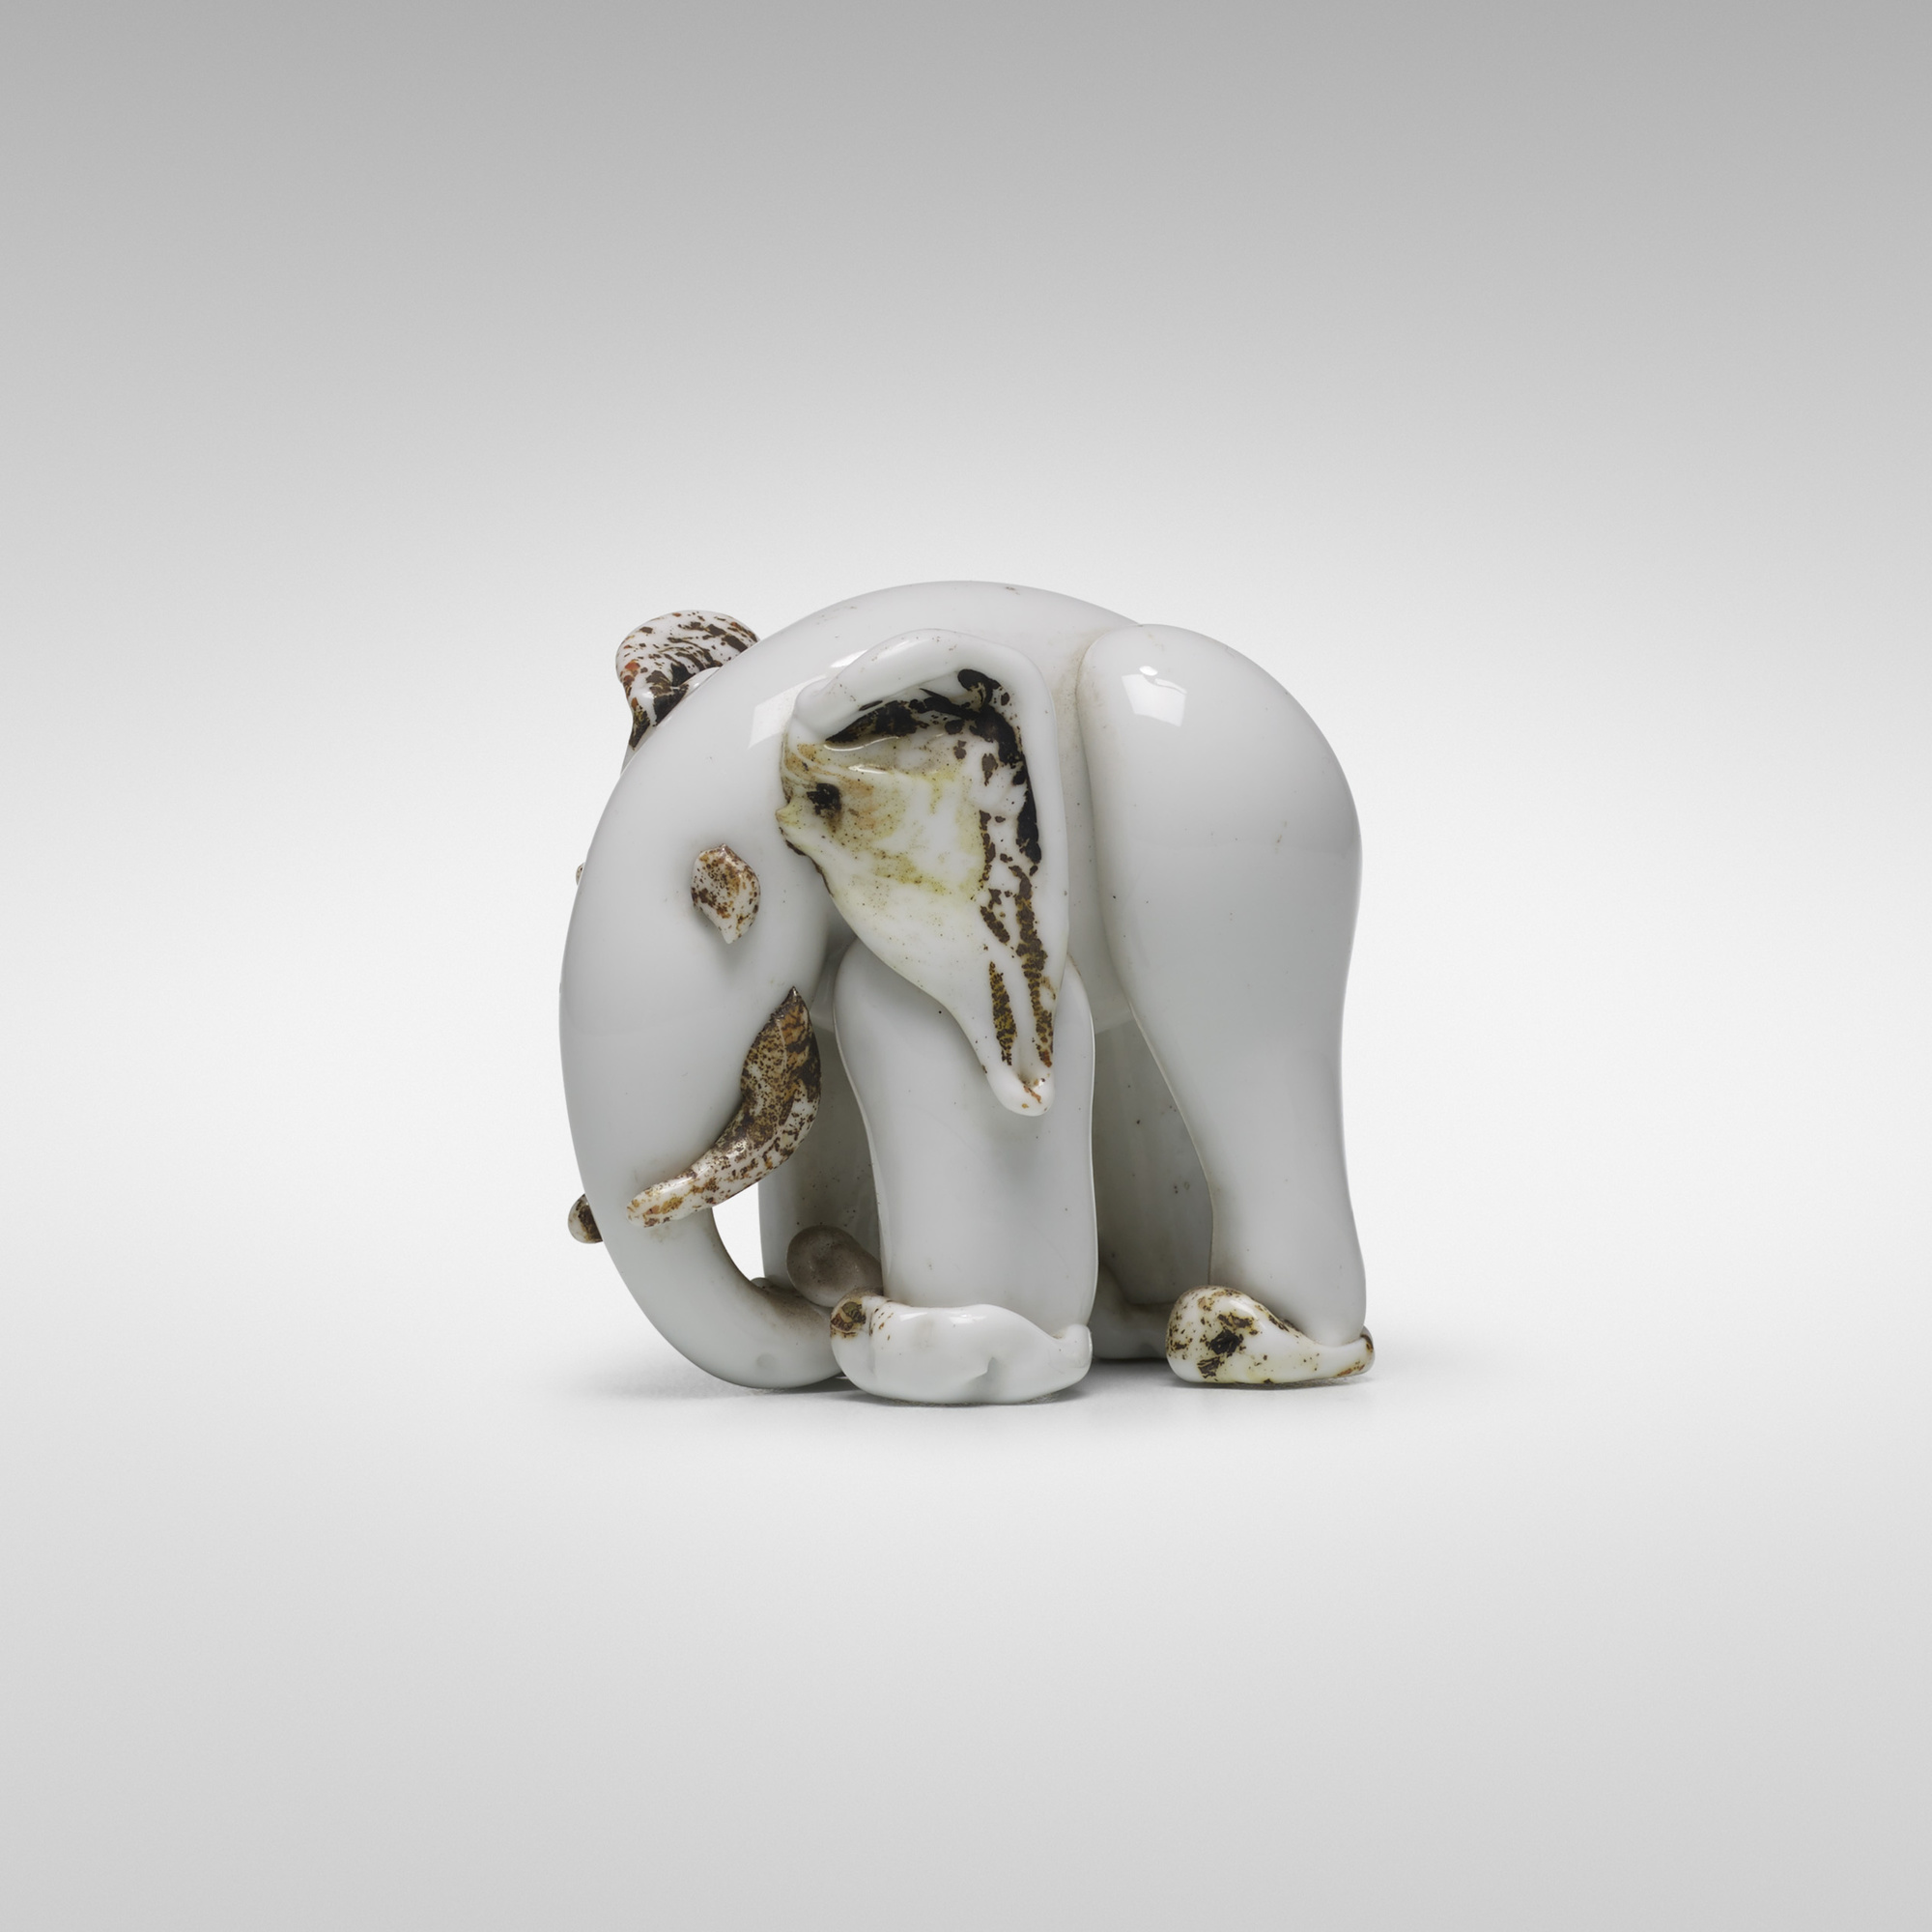 124: Ercole Barovier / Elefante (1 of 2)